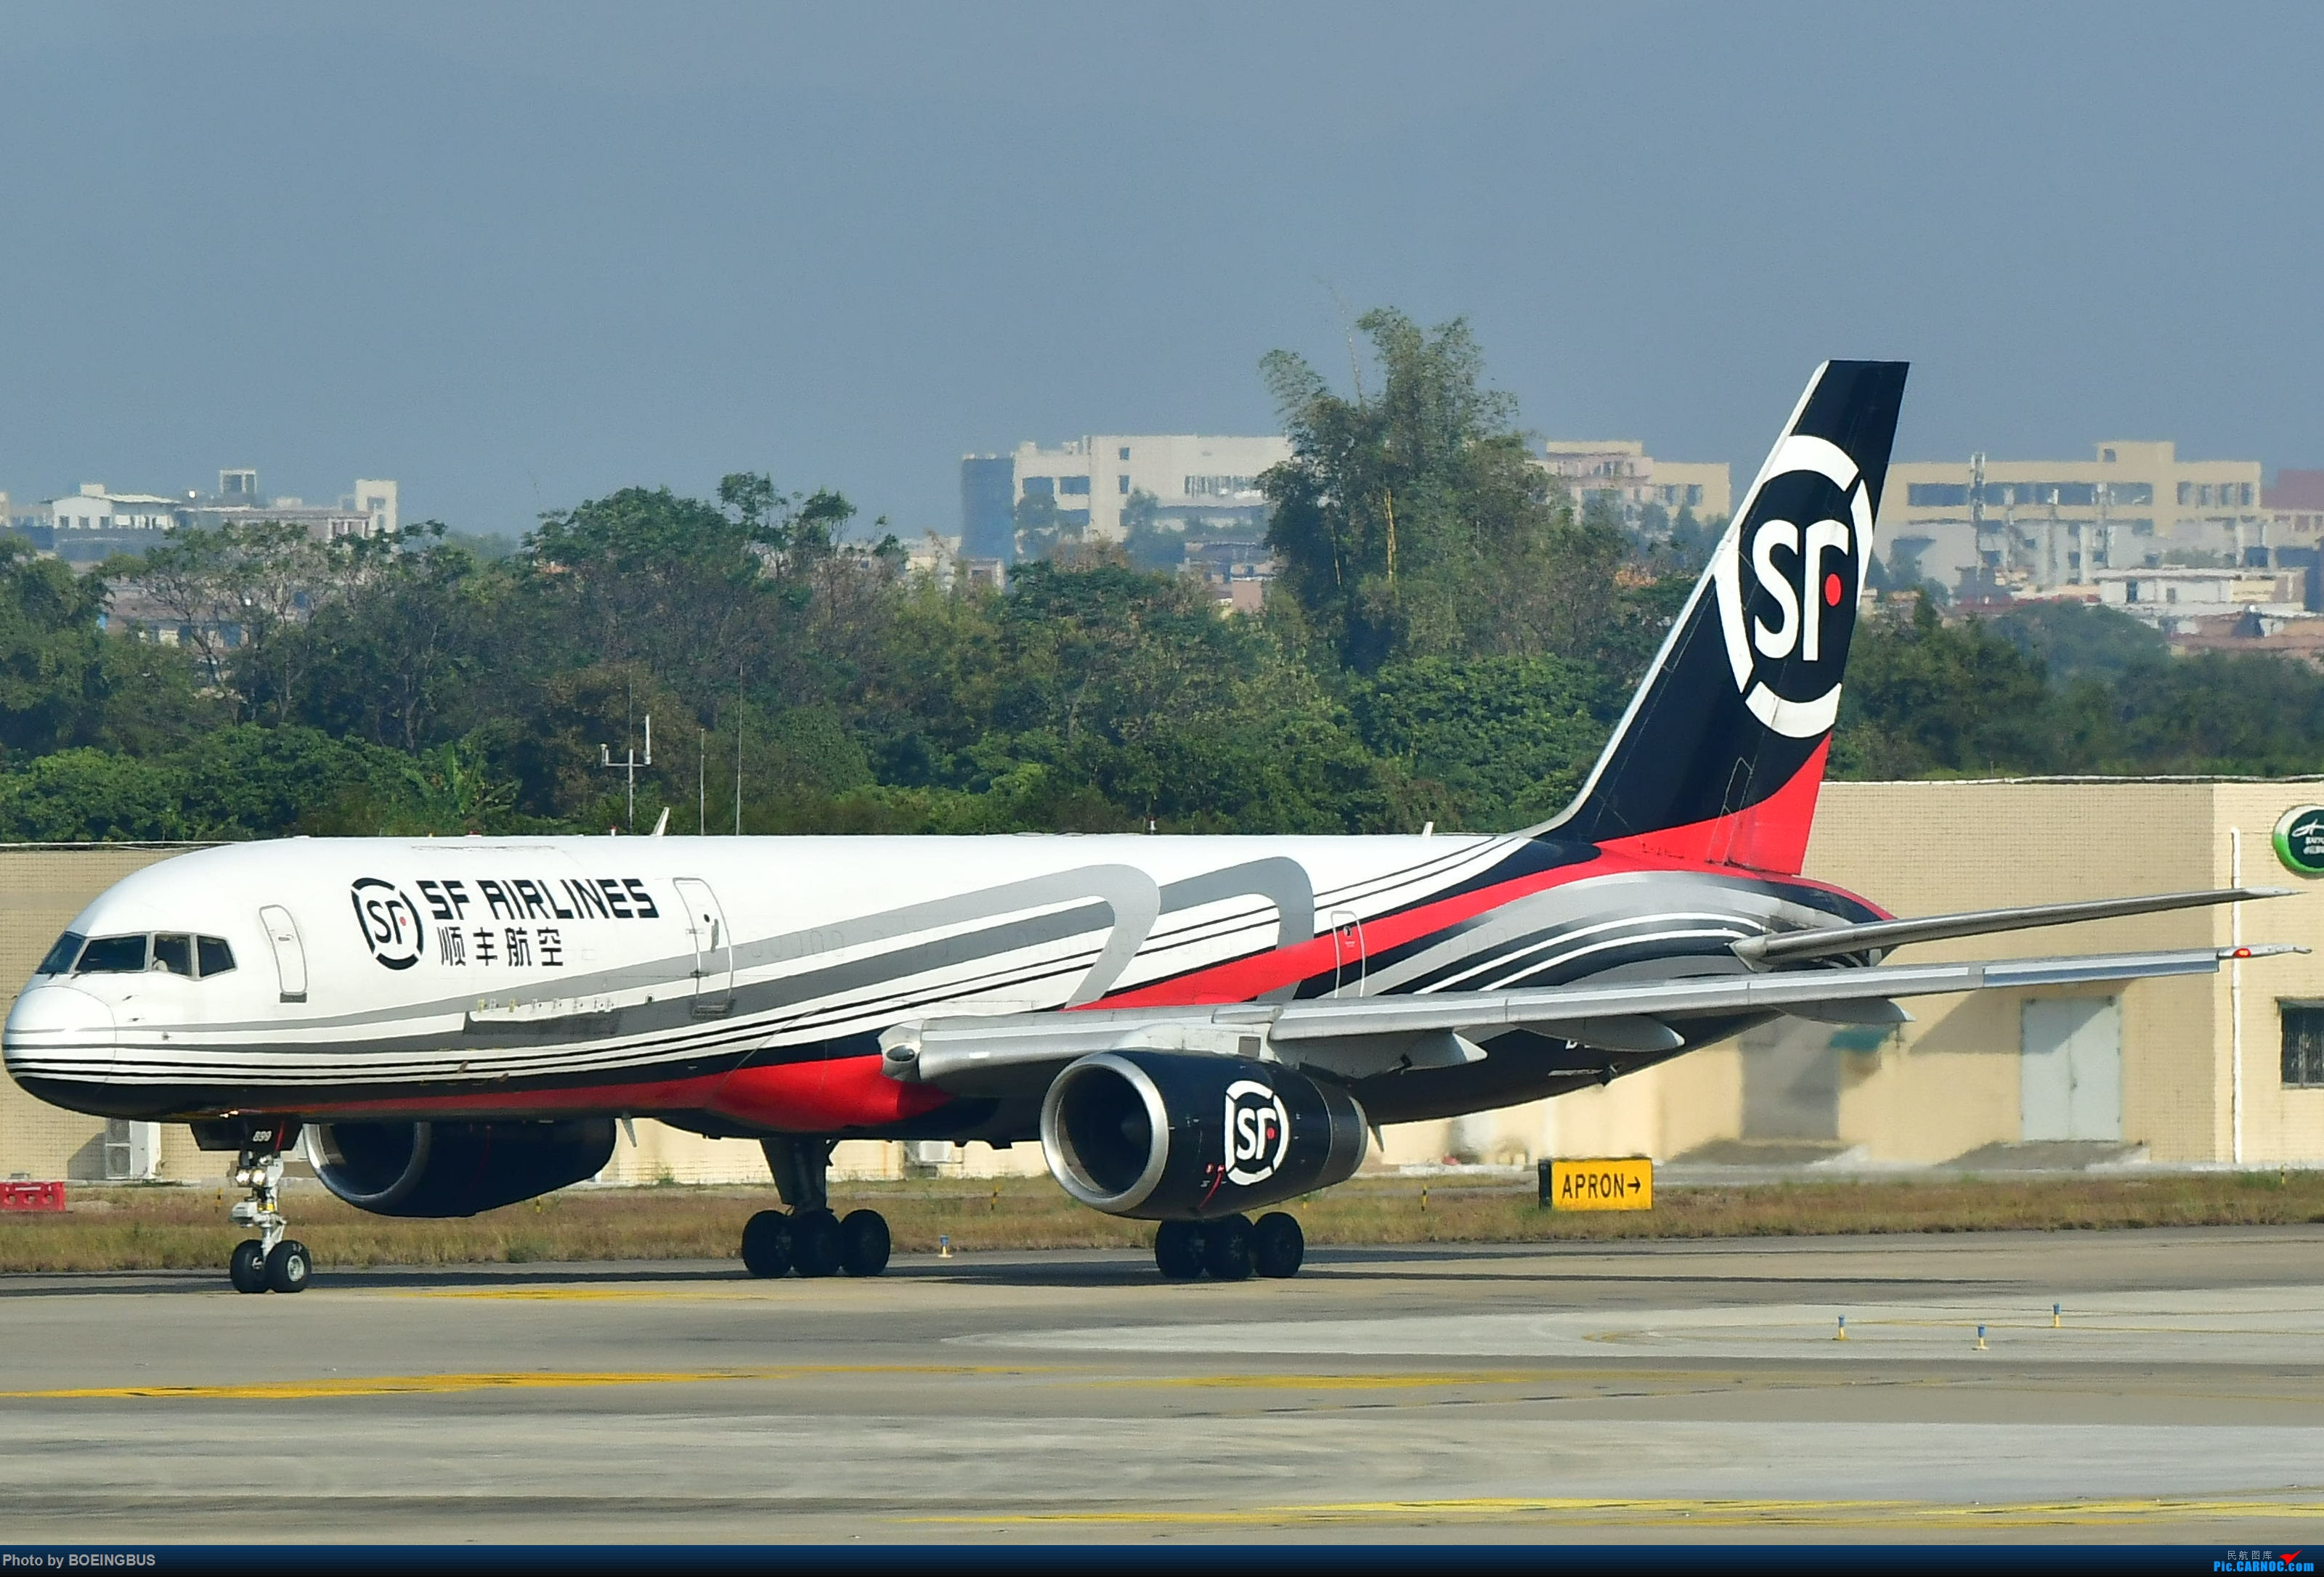 Re:[原创]一批拙作,祝CARNOC的飞友们鼠年大吉! BOEING 757-200 B-2899 中国广州白云国际机场